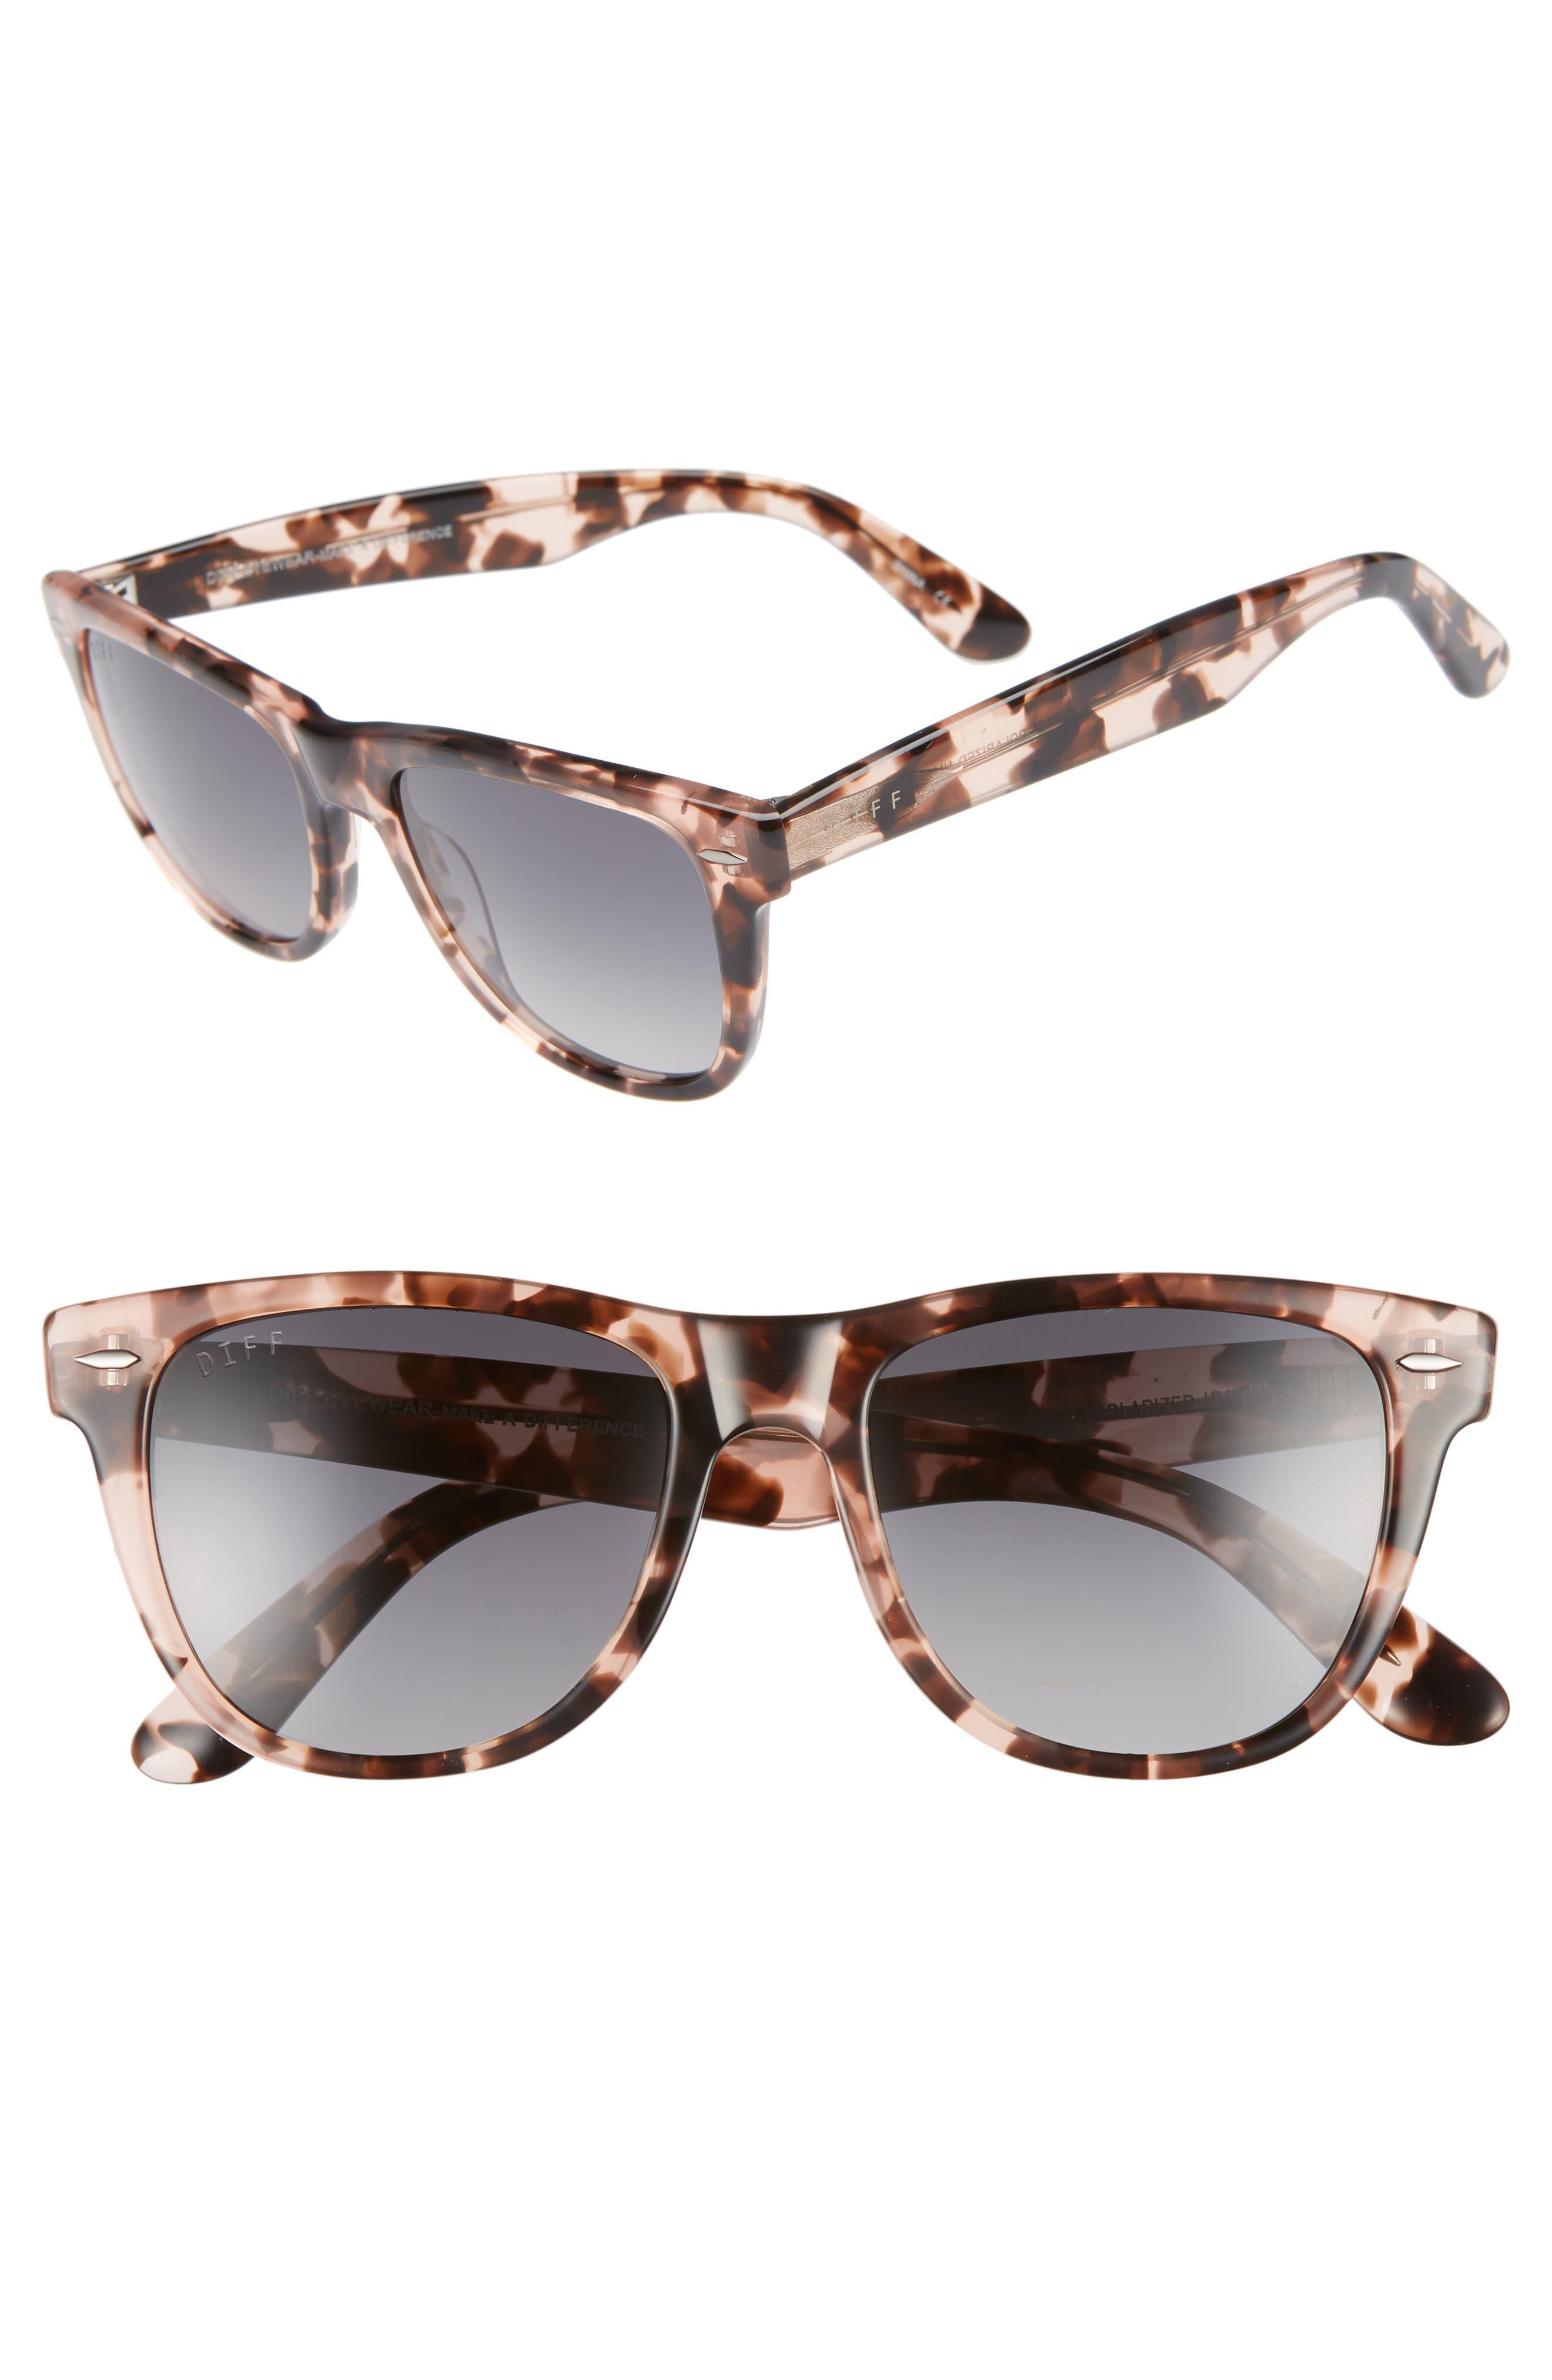 Kota 51mm Gradient Polarized Cat Eye Sunglasses,                             Main thumbnail 1, color,                             HIMALYAN/ GREY